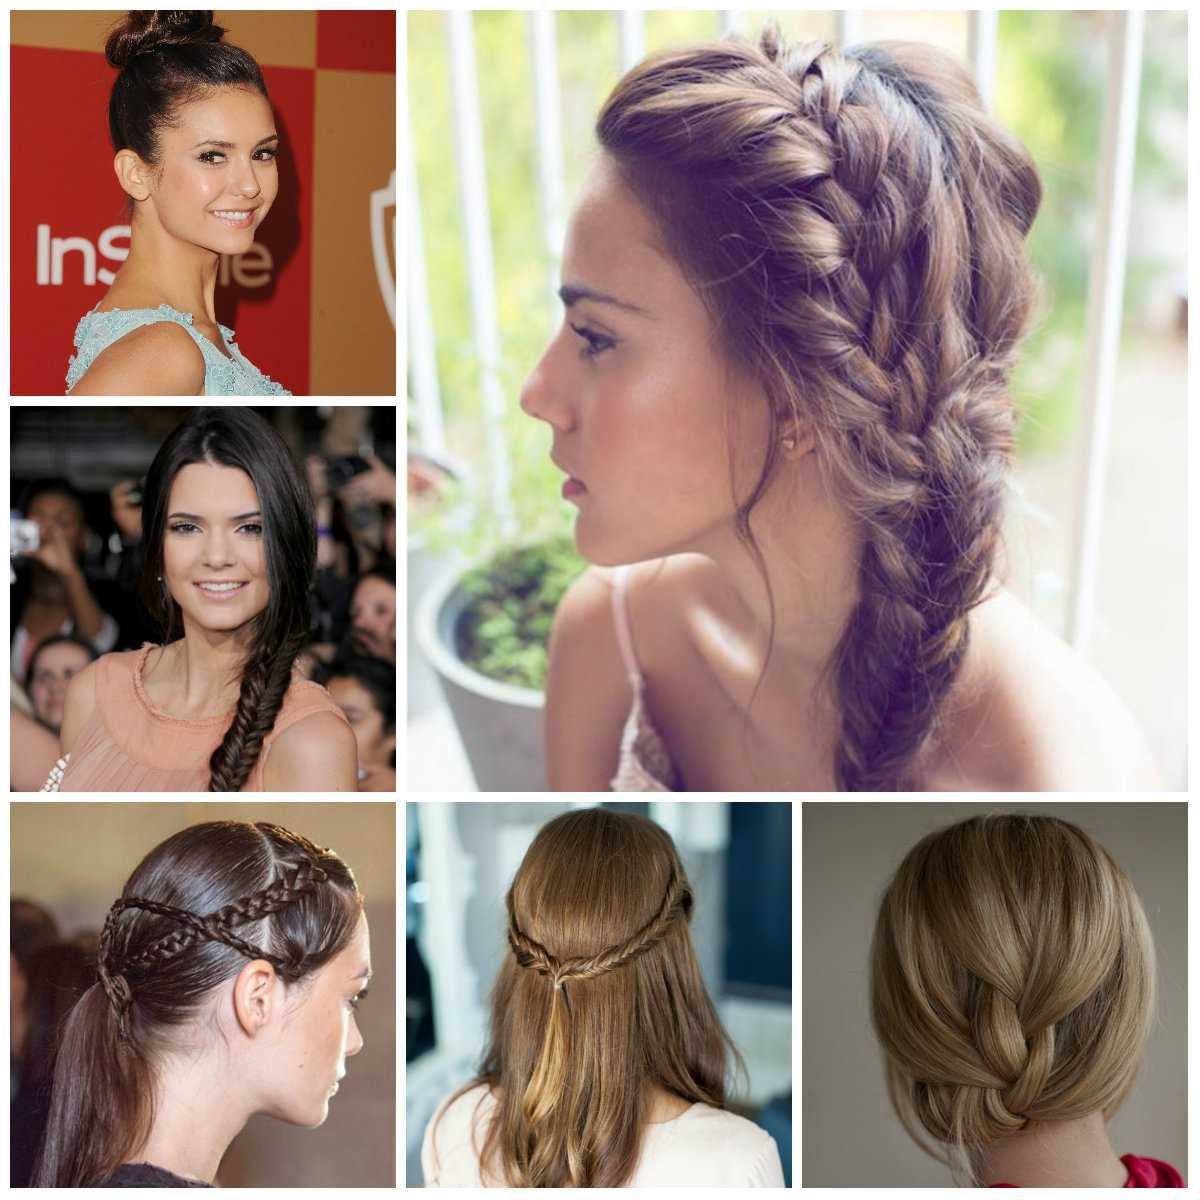 braided-hairstyles-2016